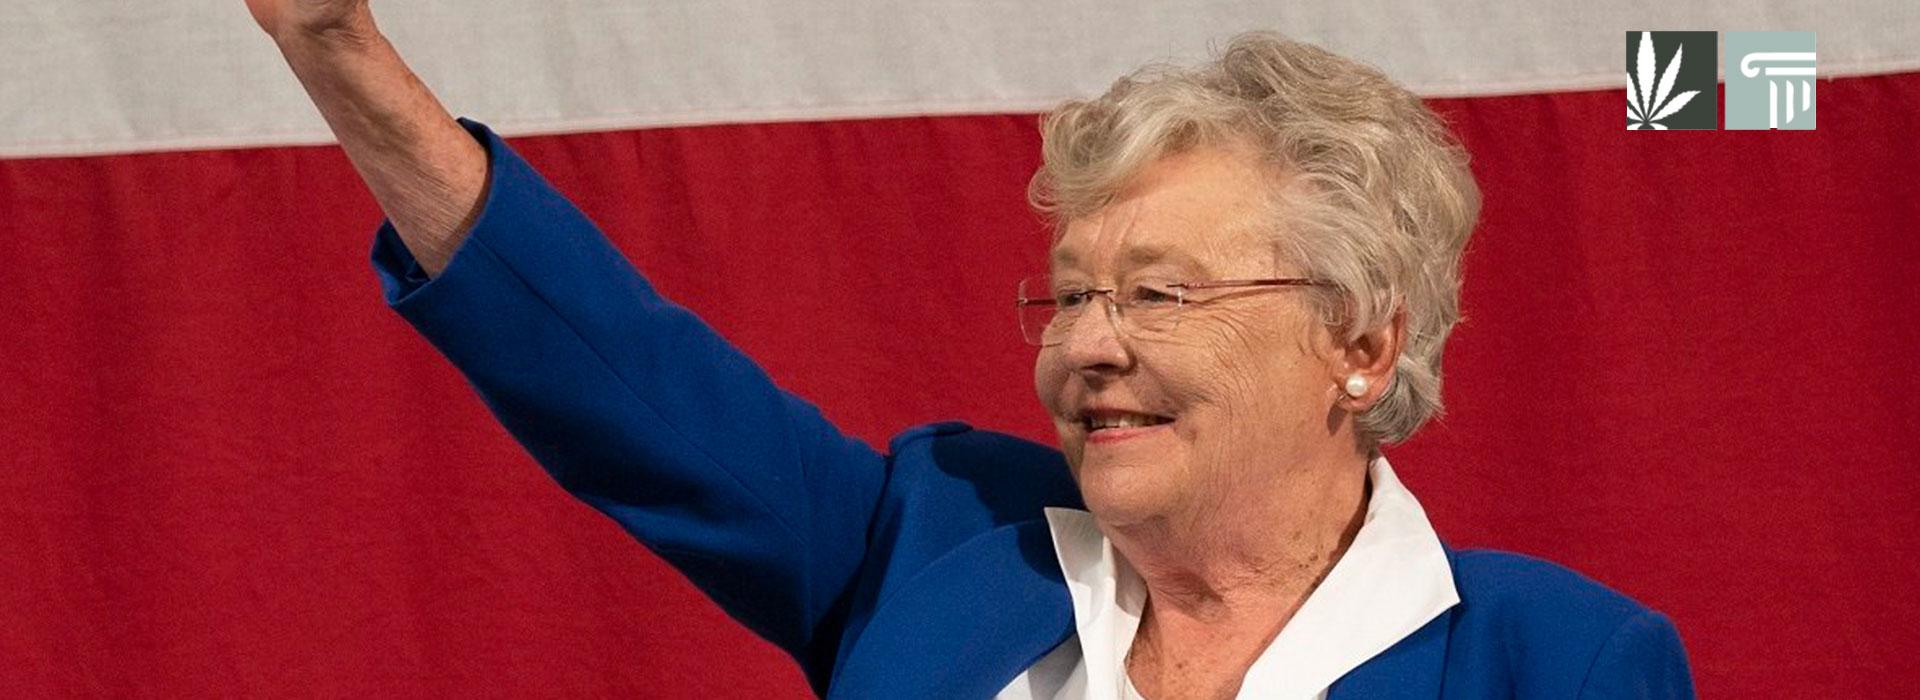 Alabama gov Kay Ivey signs medical marijuana legislation